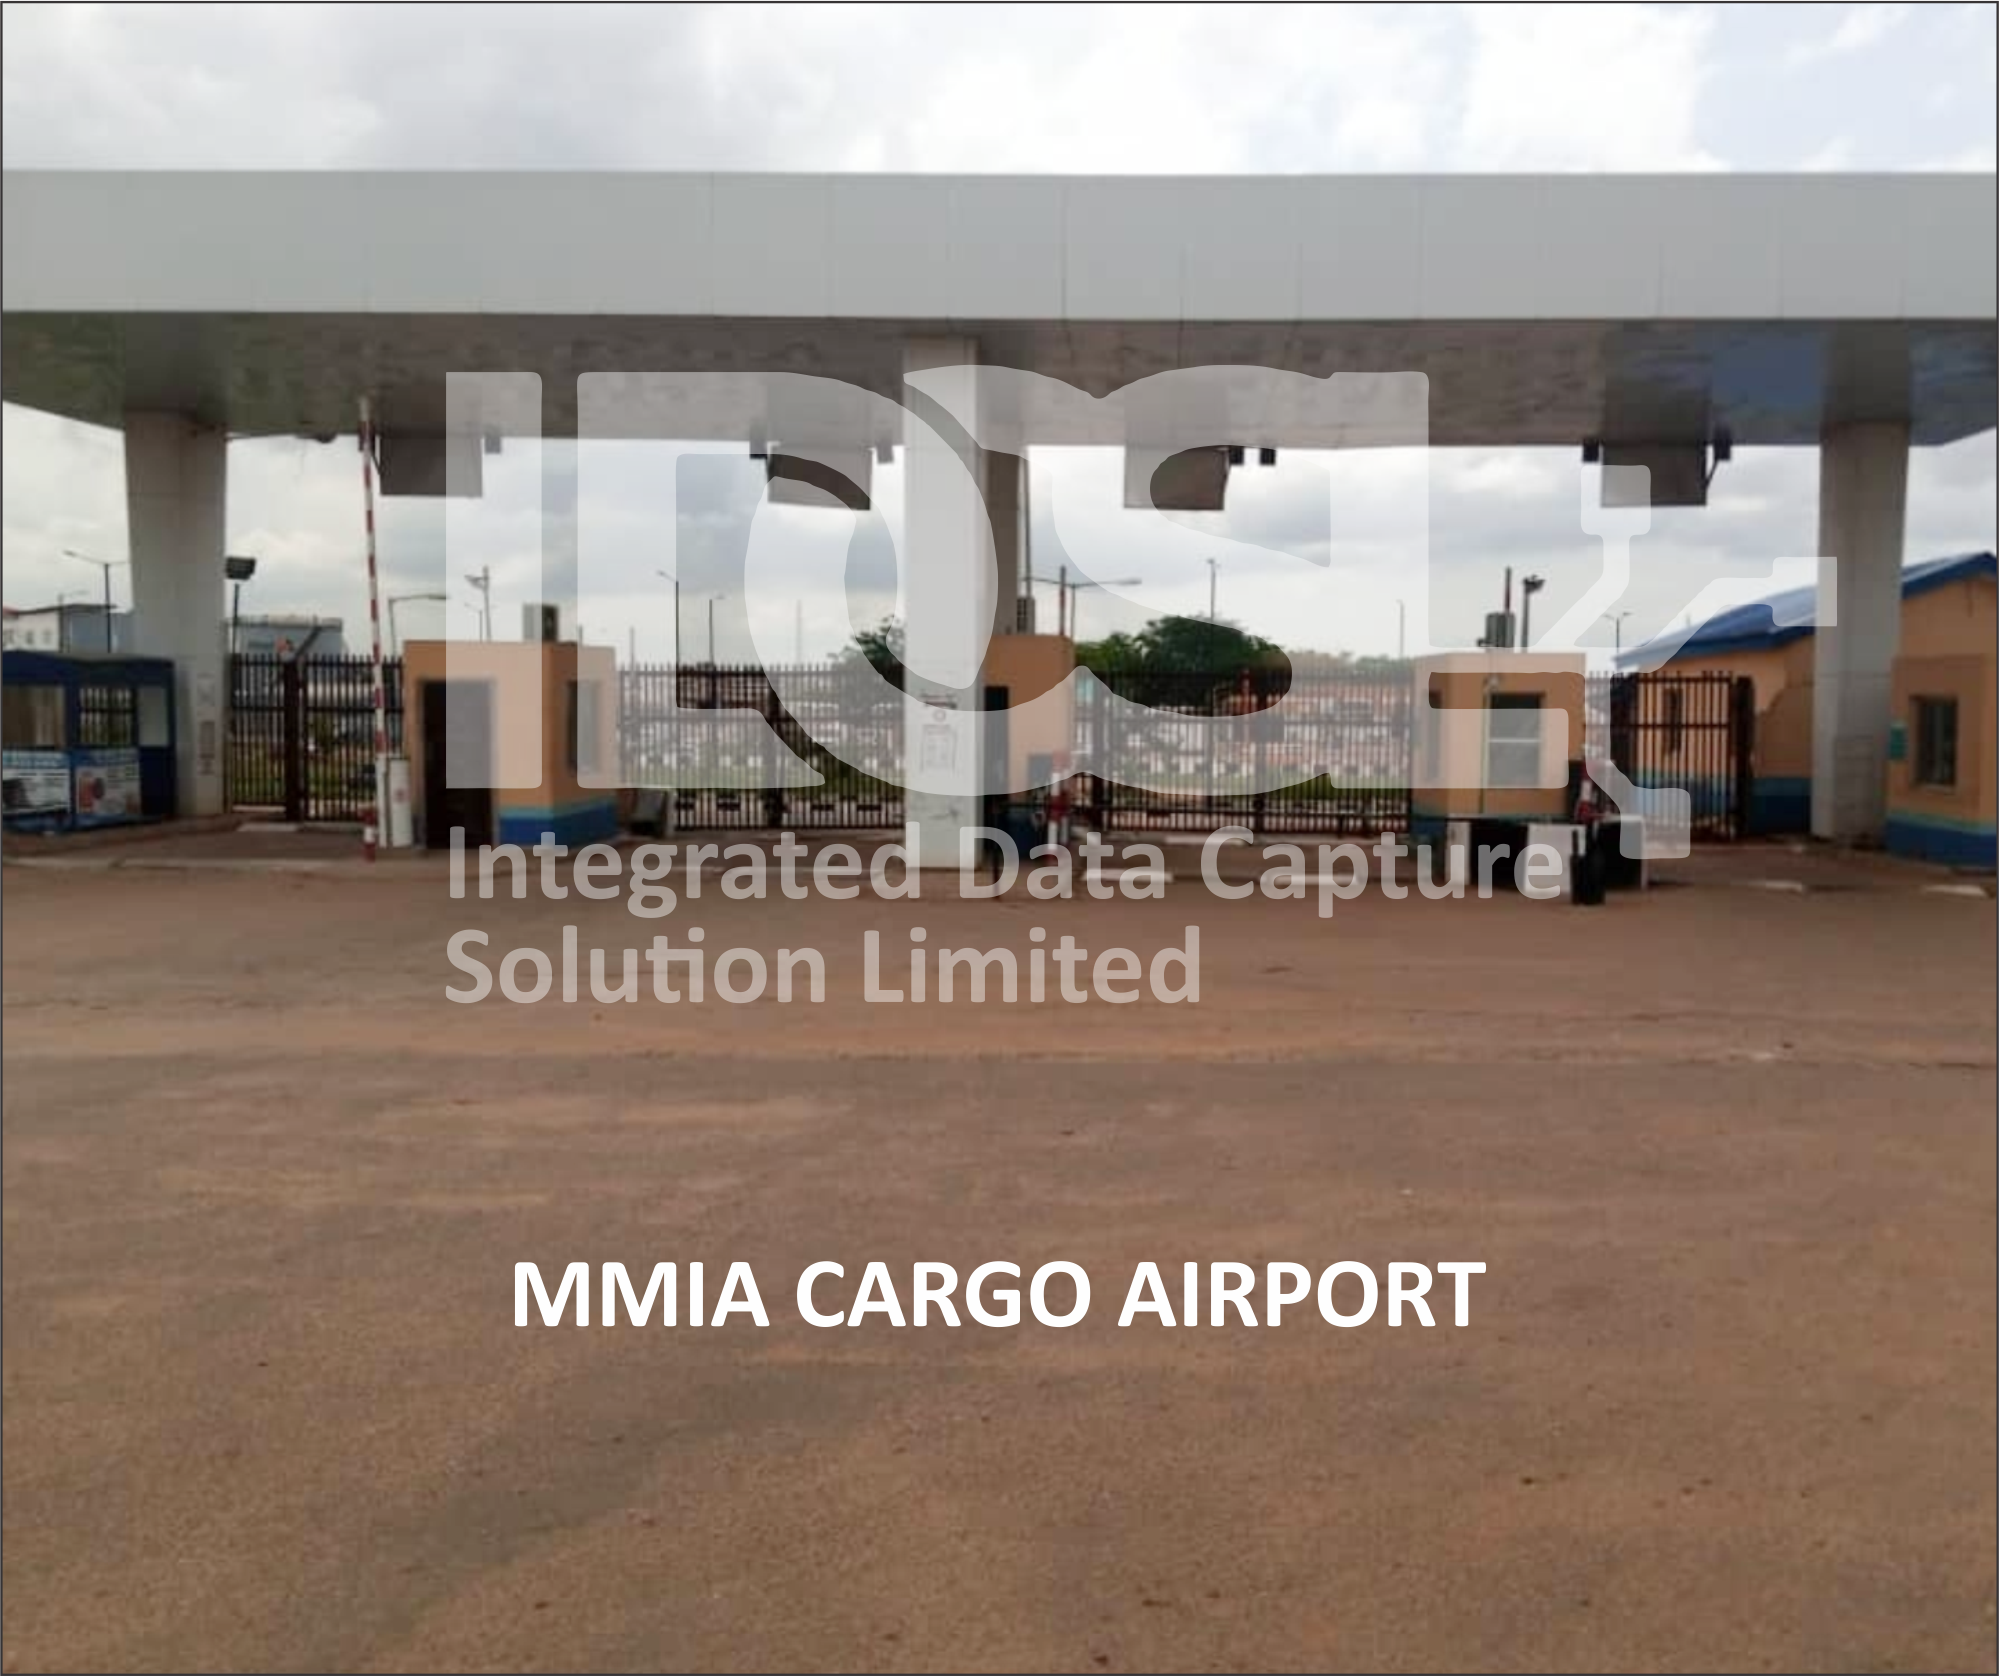 MMIA CARGO AIRPORT 4